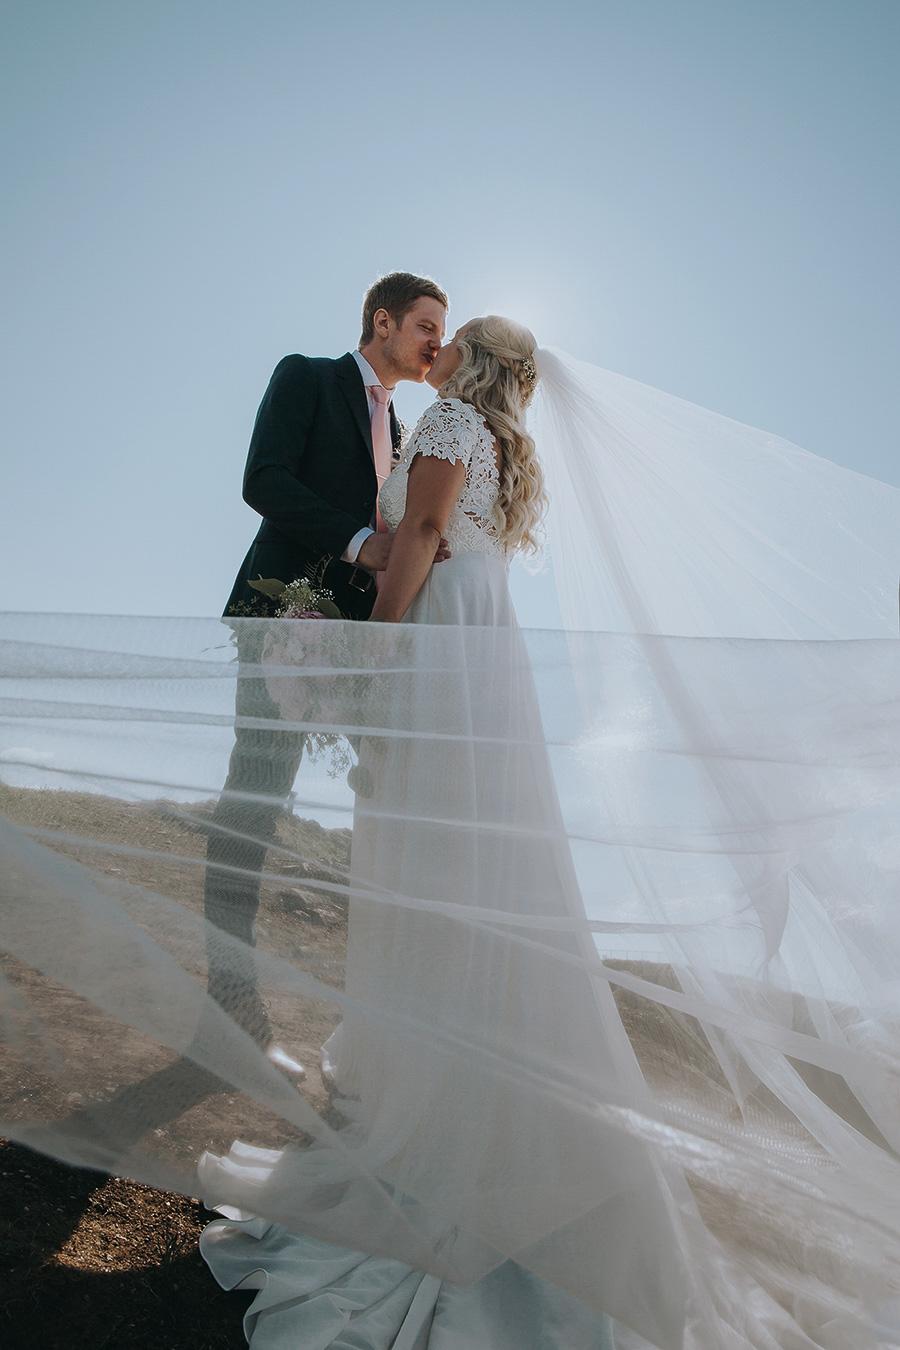 Bridal couple kissing in the sunlight in Tromsø